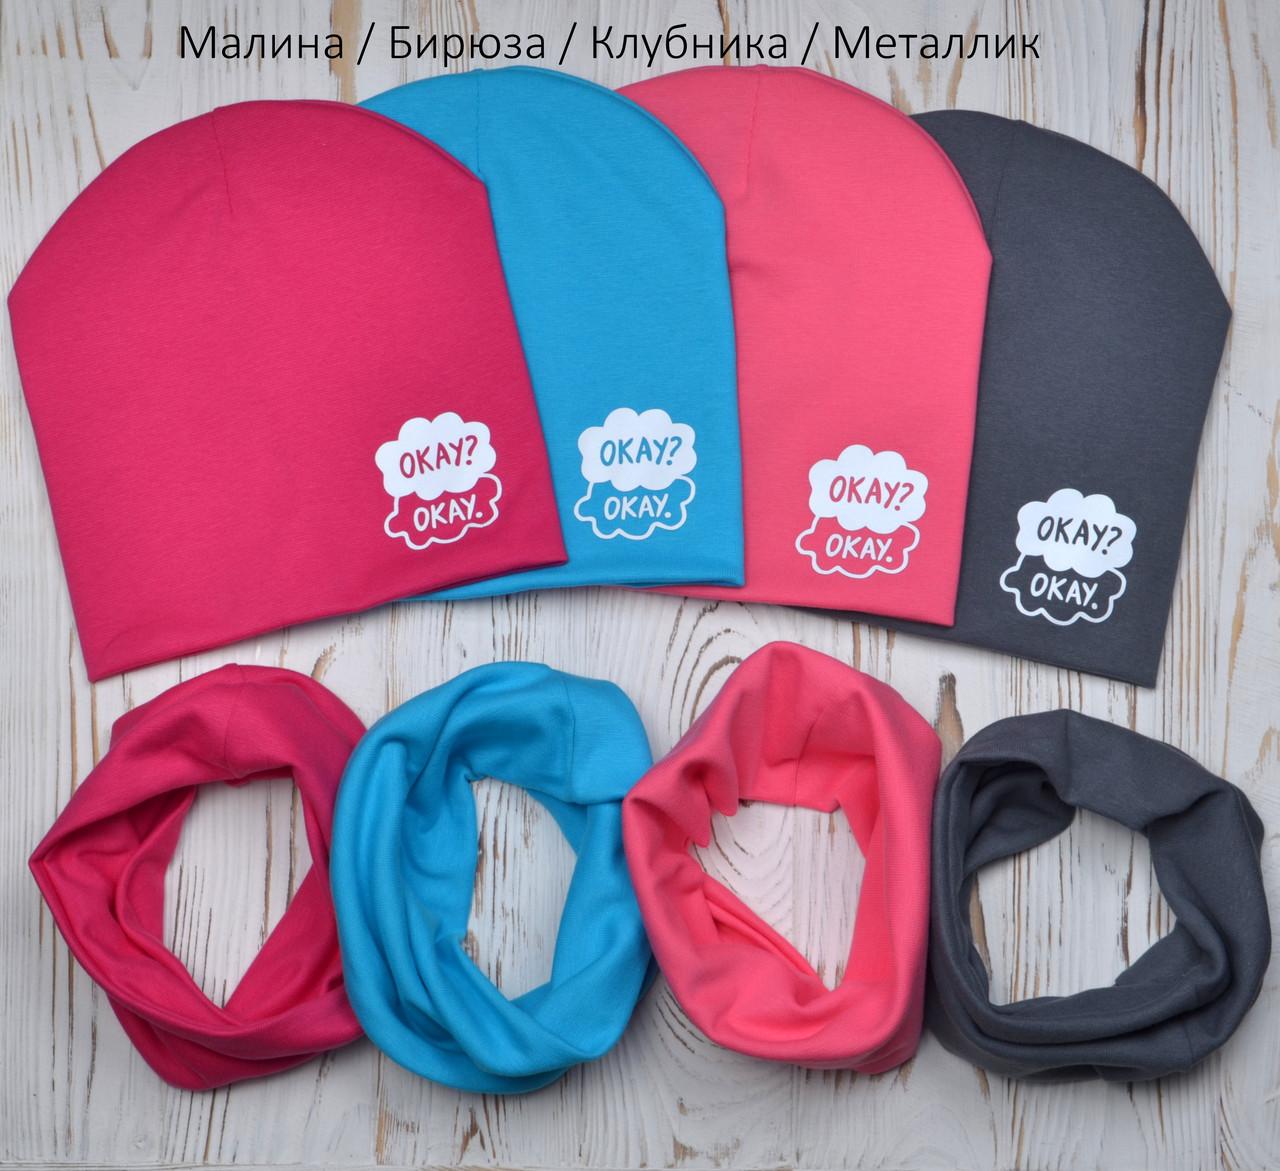 200 К-т шапка+хомут OKAY светоотраж. р.52-55  т.синий, малина, бирюза, клубника, черный